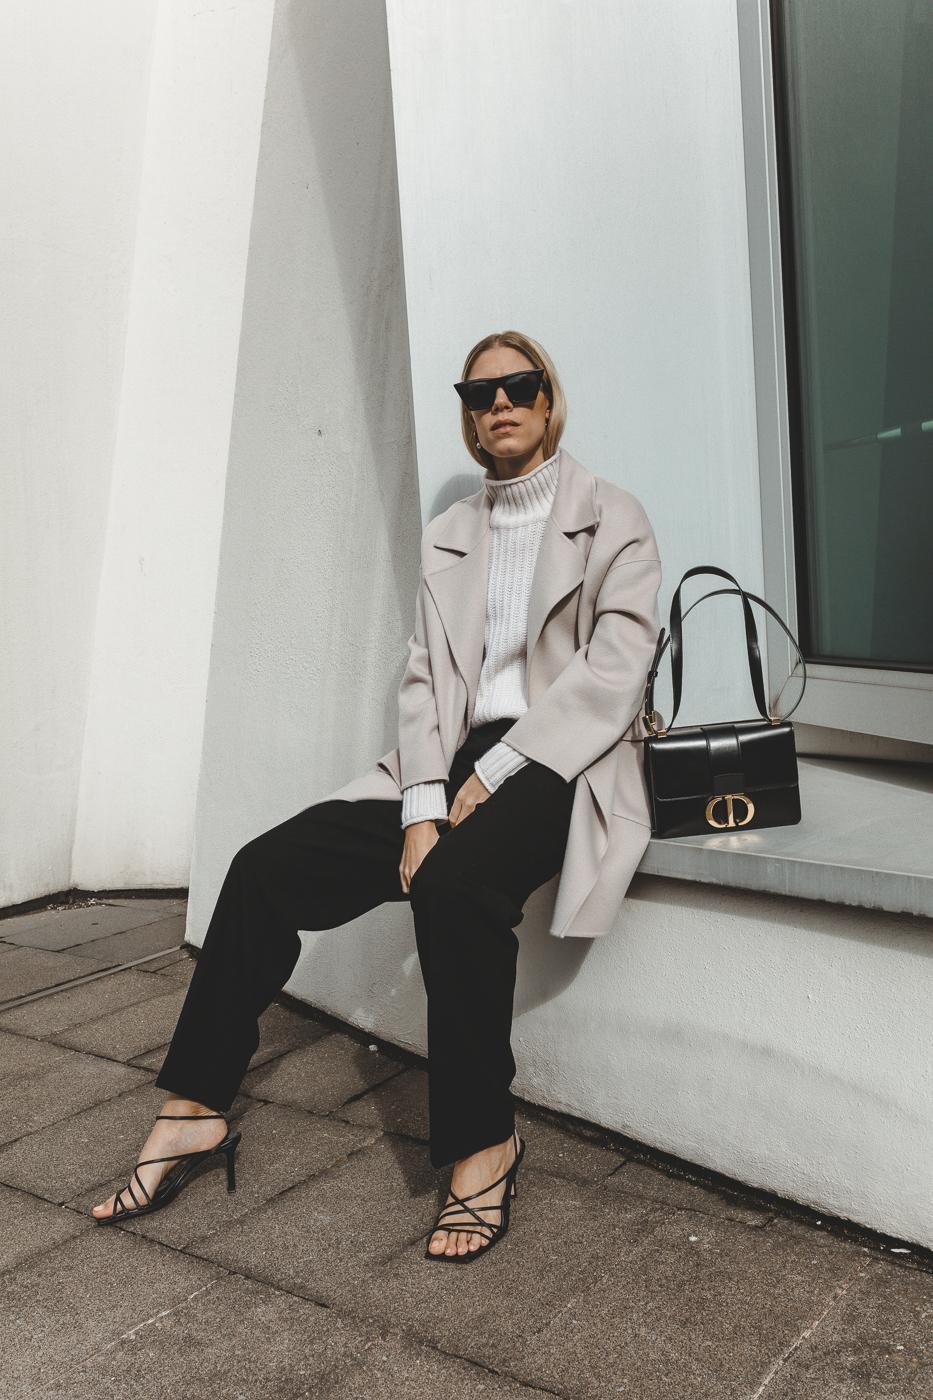 FTC Cashmere Kaschmirmantel Dior Bag